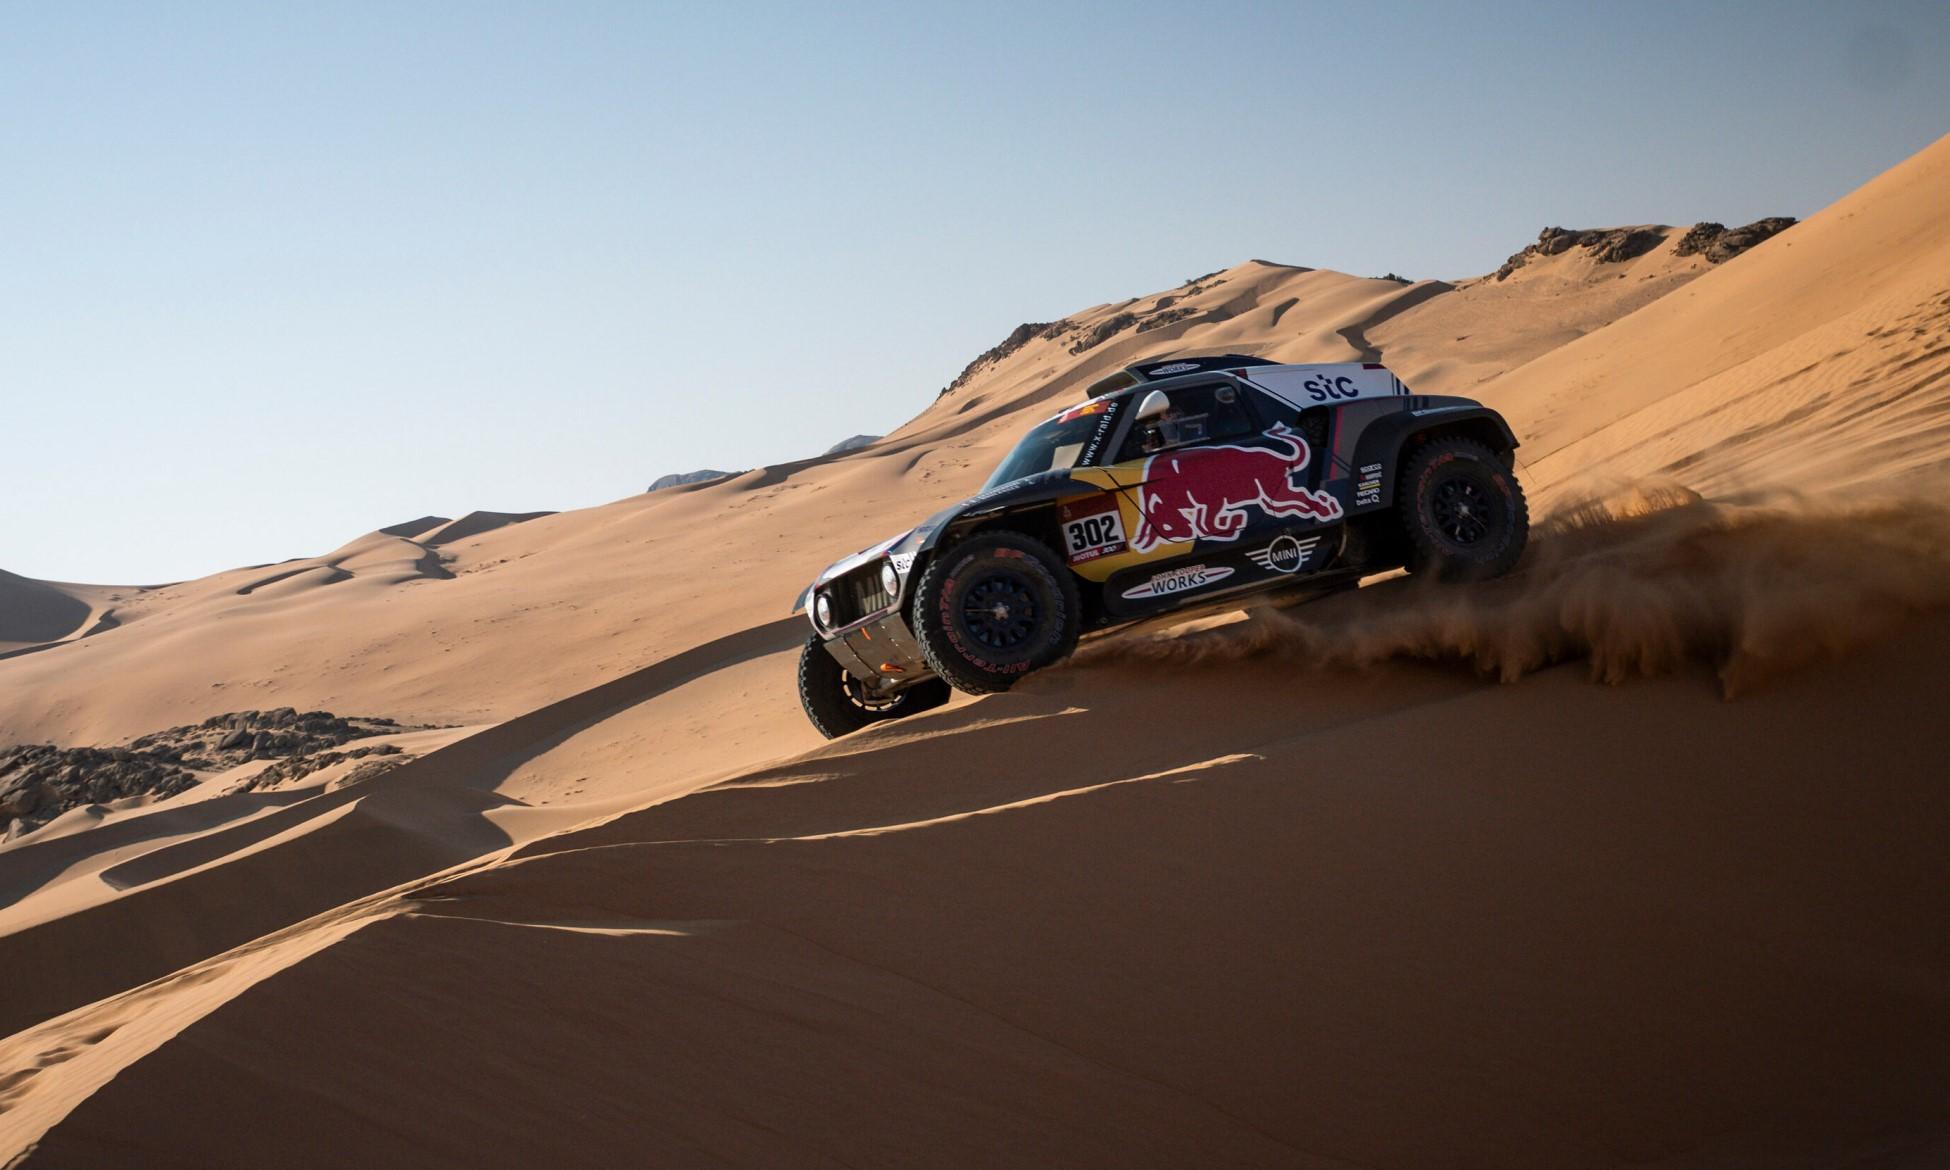 Peterhansel ran close to the leader on 2021 Dakar Stage 3